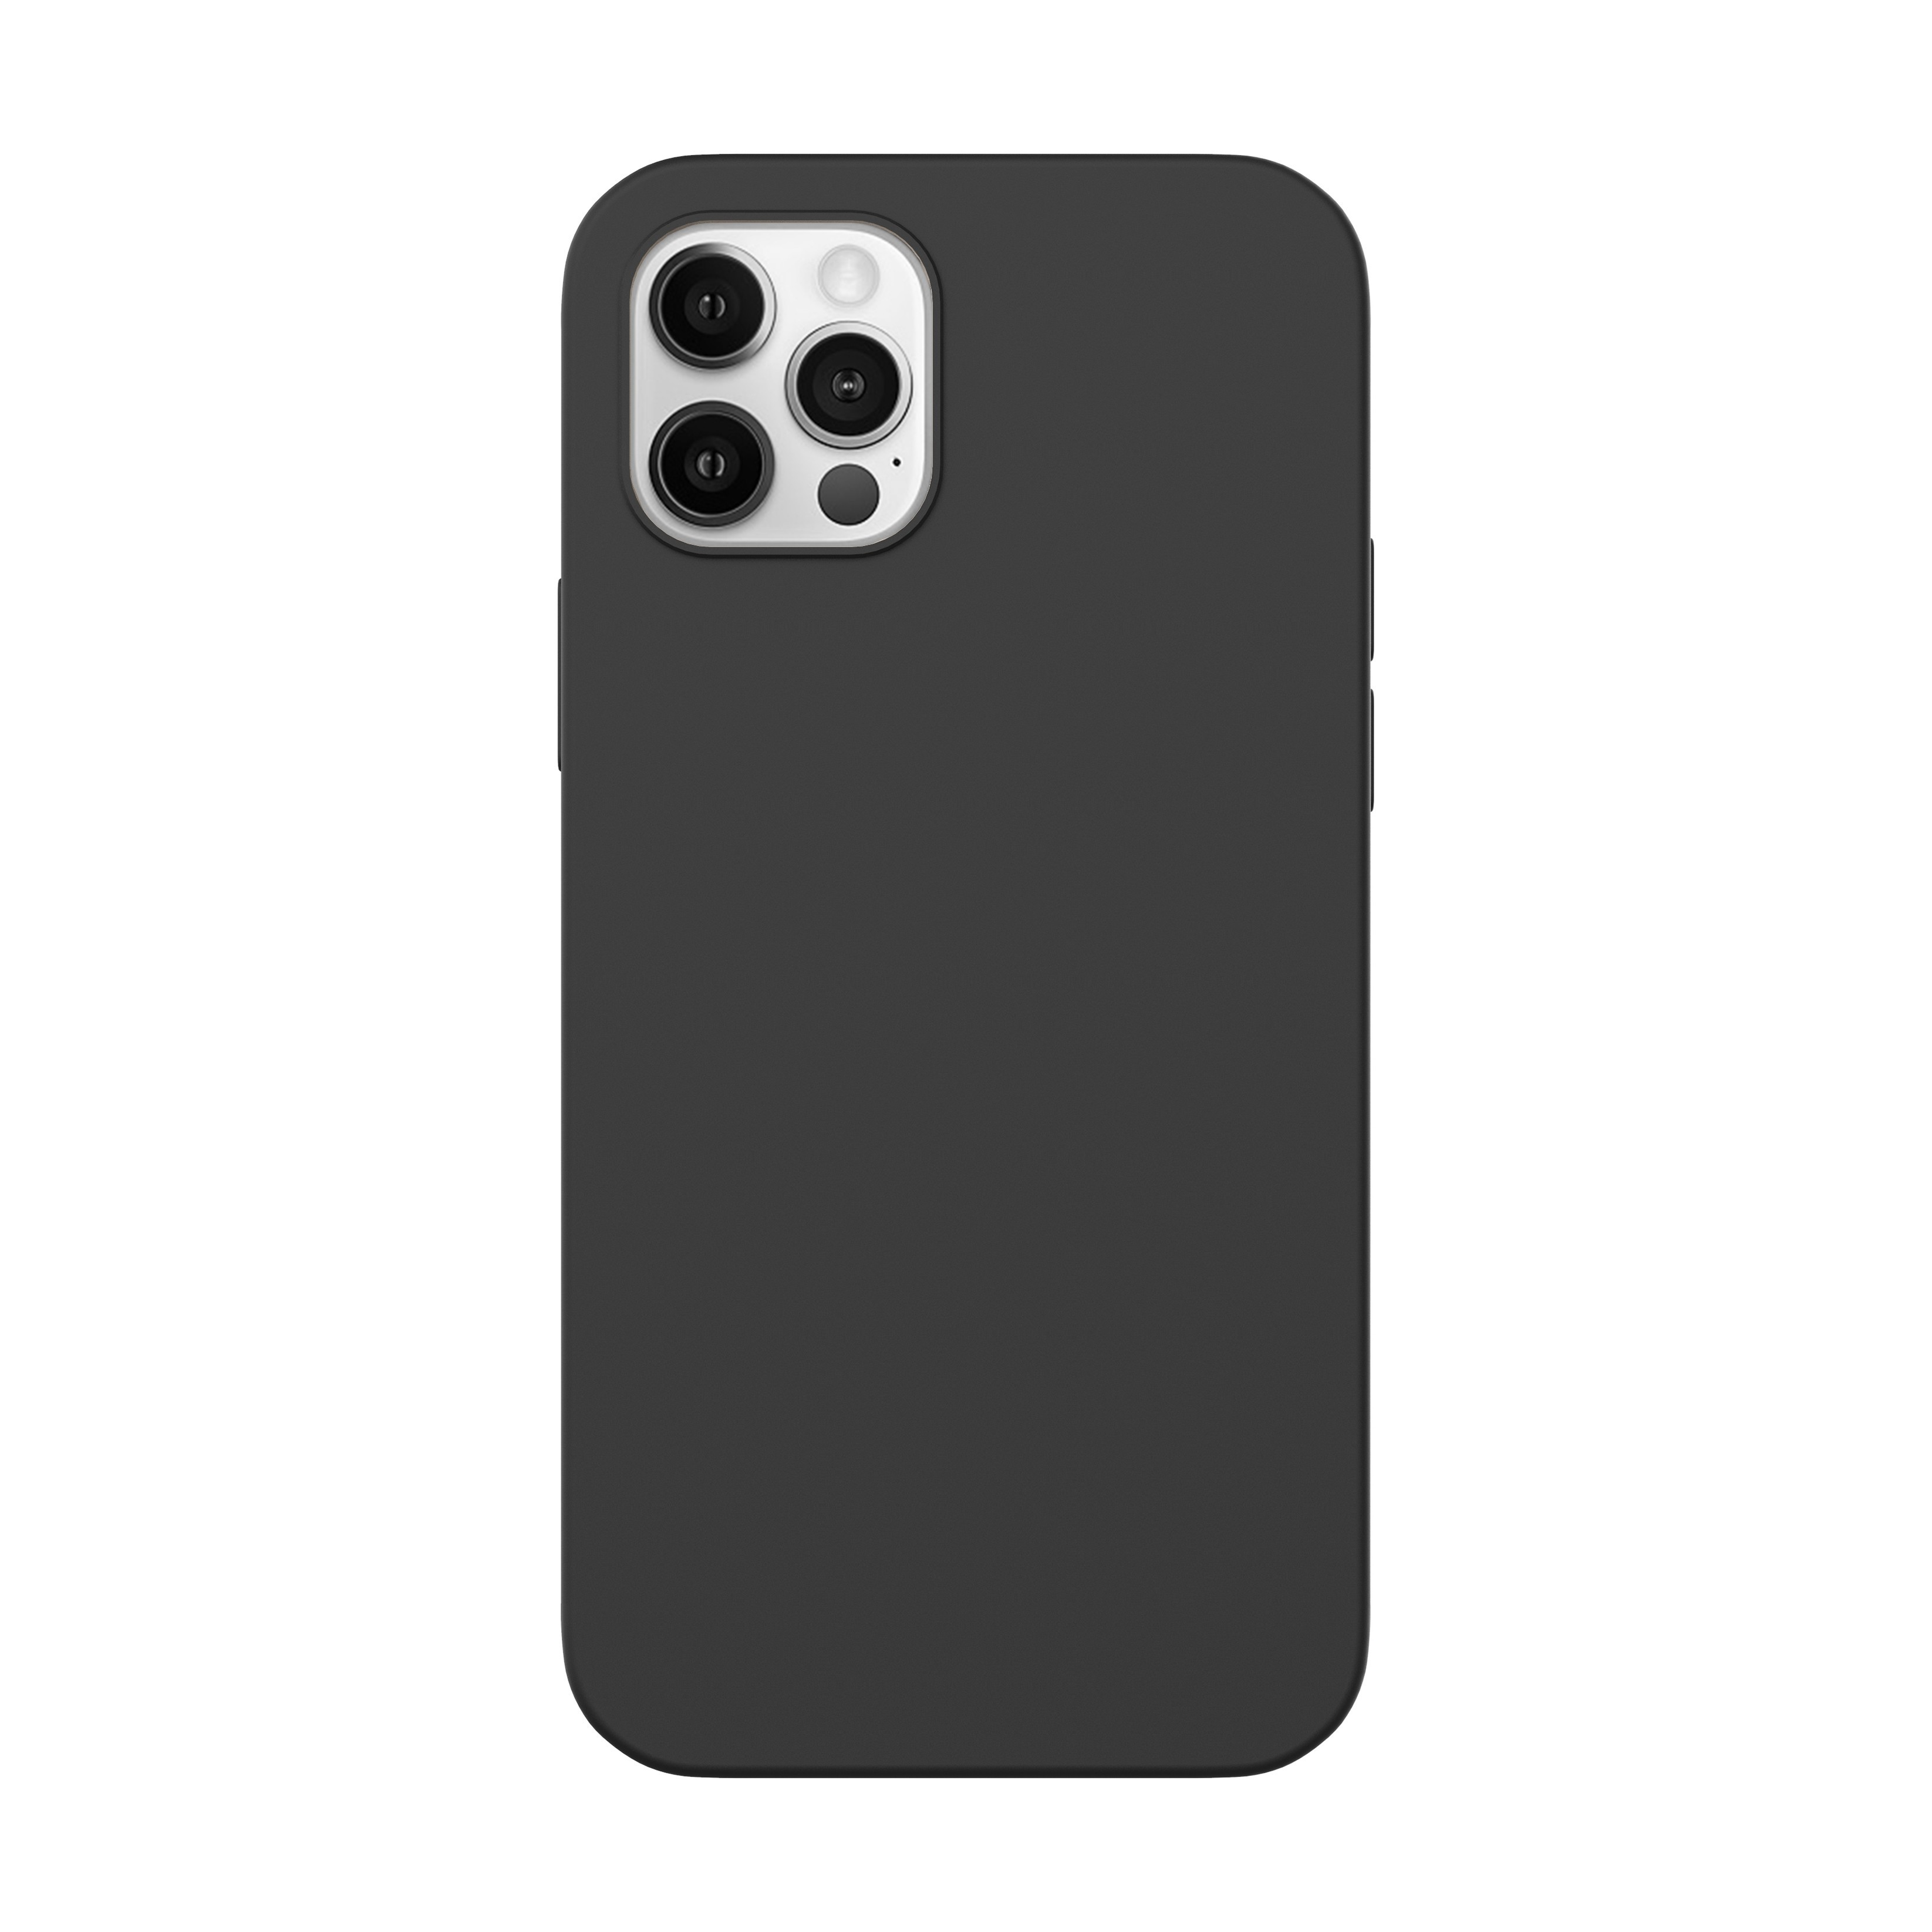 Capac protectie spate cellara din silicon colectia slim pentru iphone 12/12 pro - negru